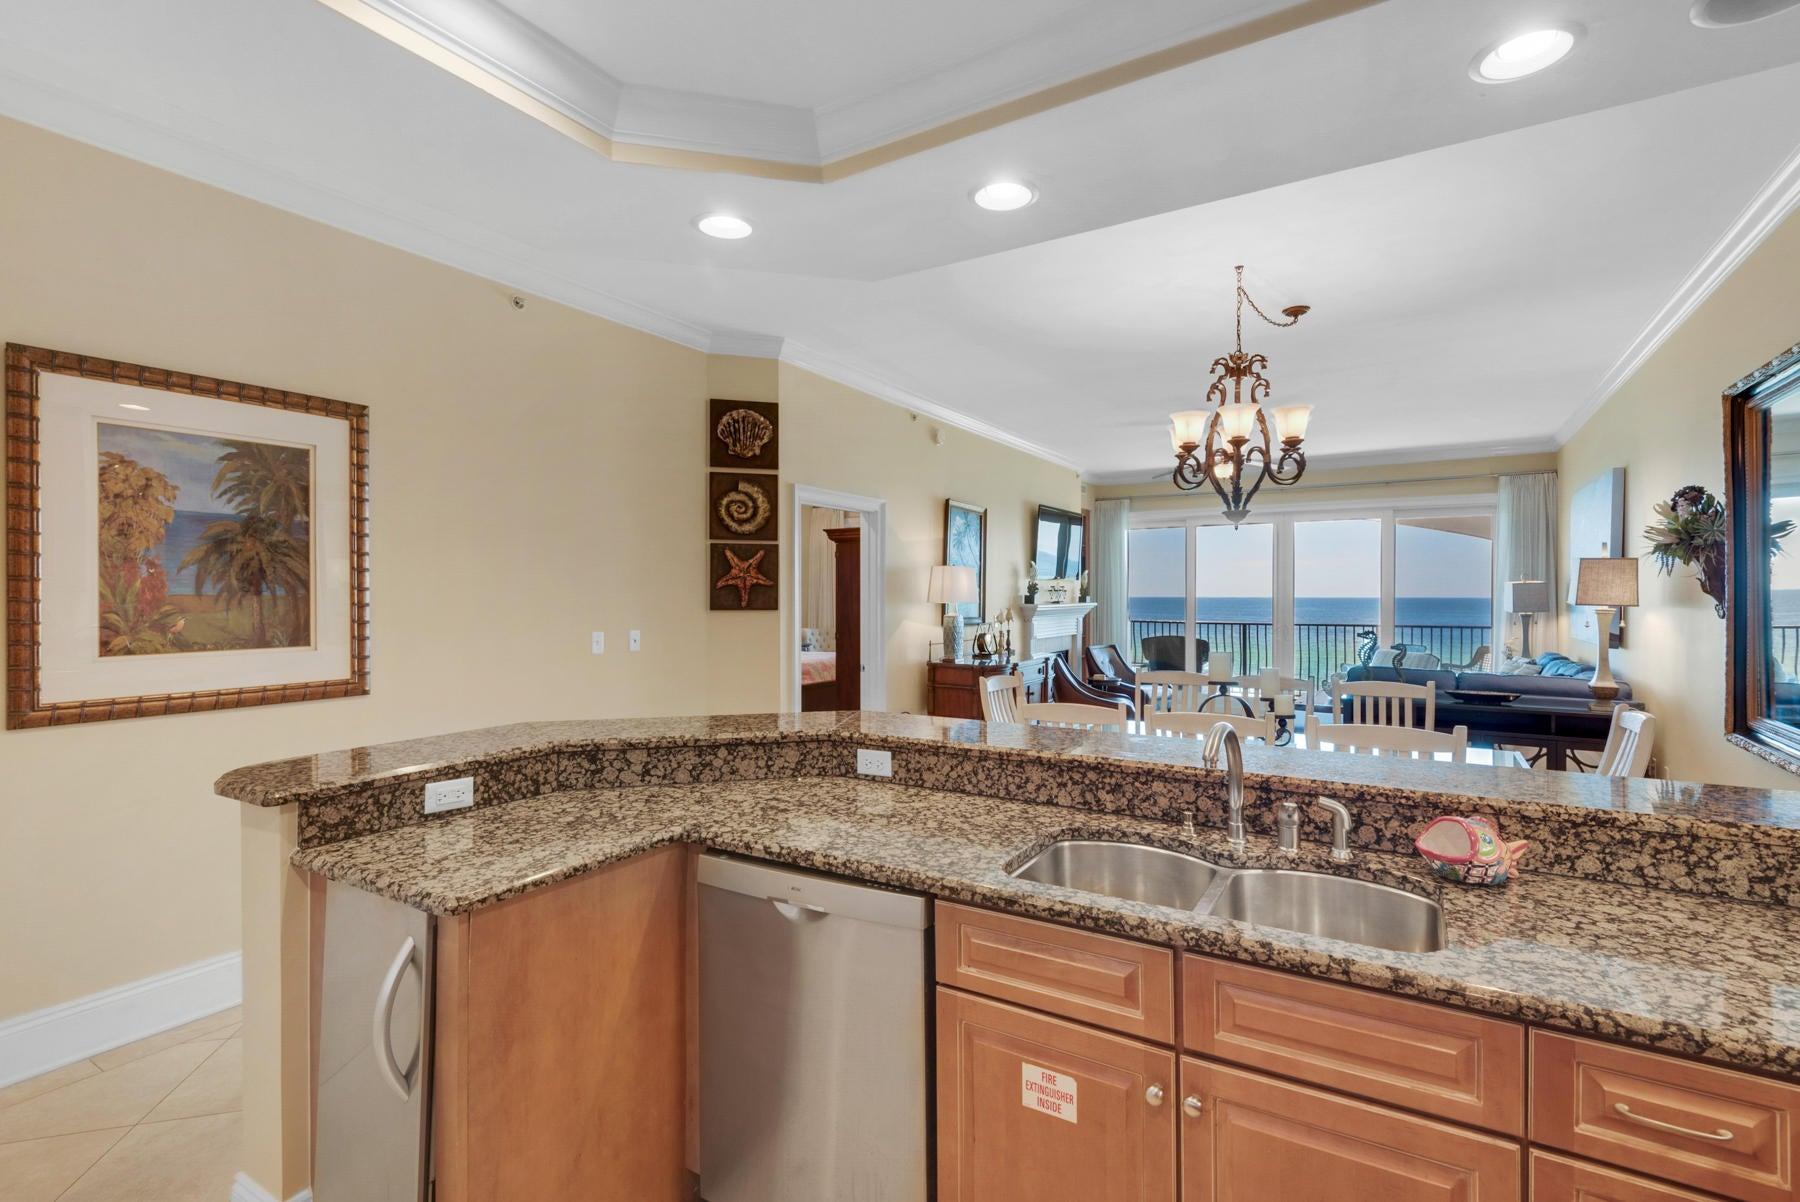 2421 Co Rd 30A,Santa Rosa Beach,Florida 32459,4 Bedrooms Bedrooms,3 BathroomsBathrooms,Condominium,Co Rd 30A,20131126143817002353000000